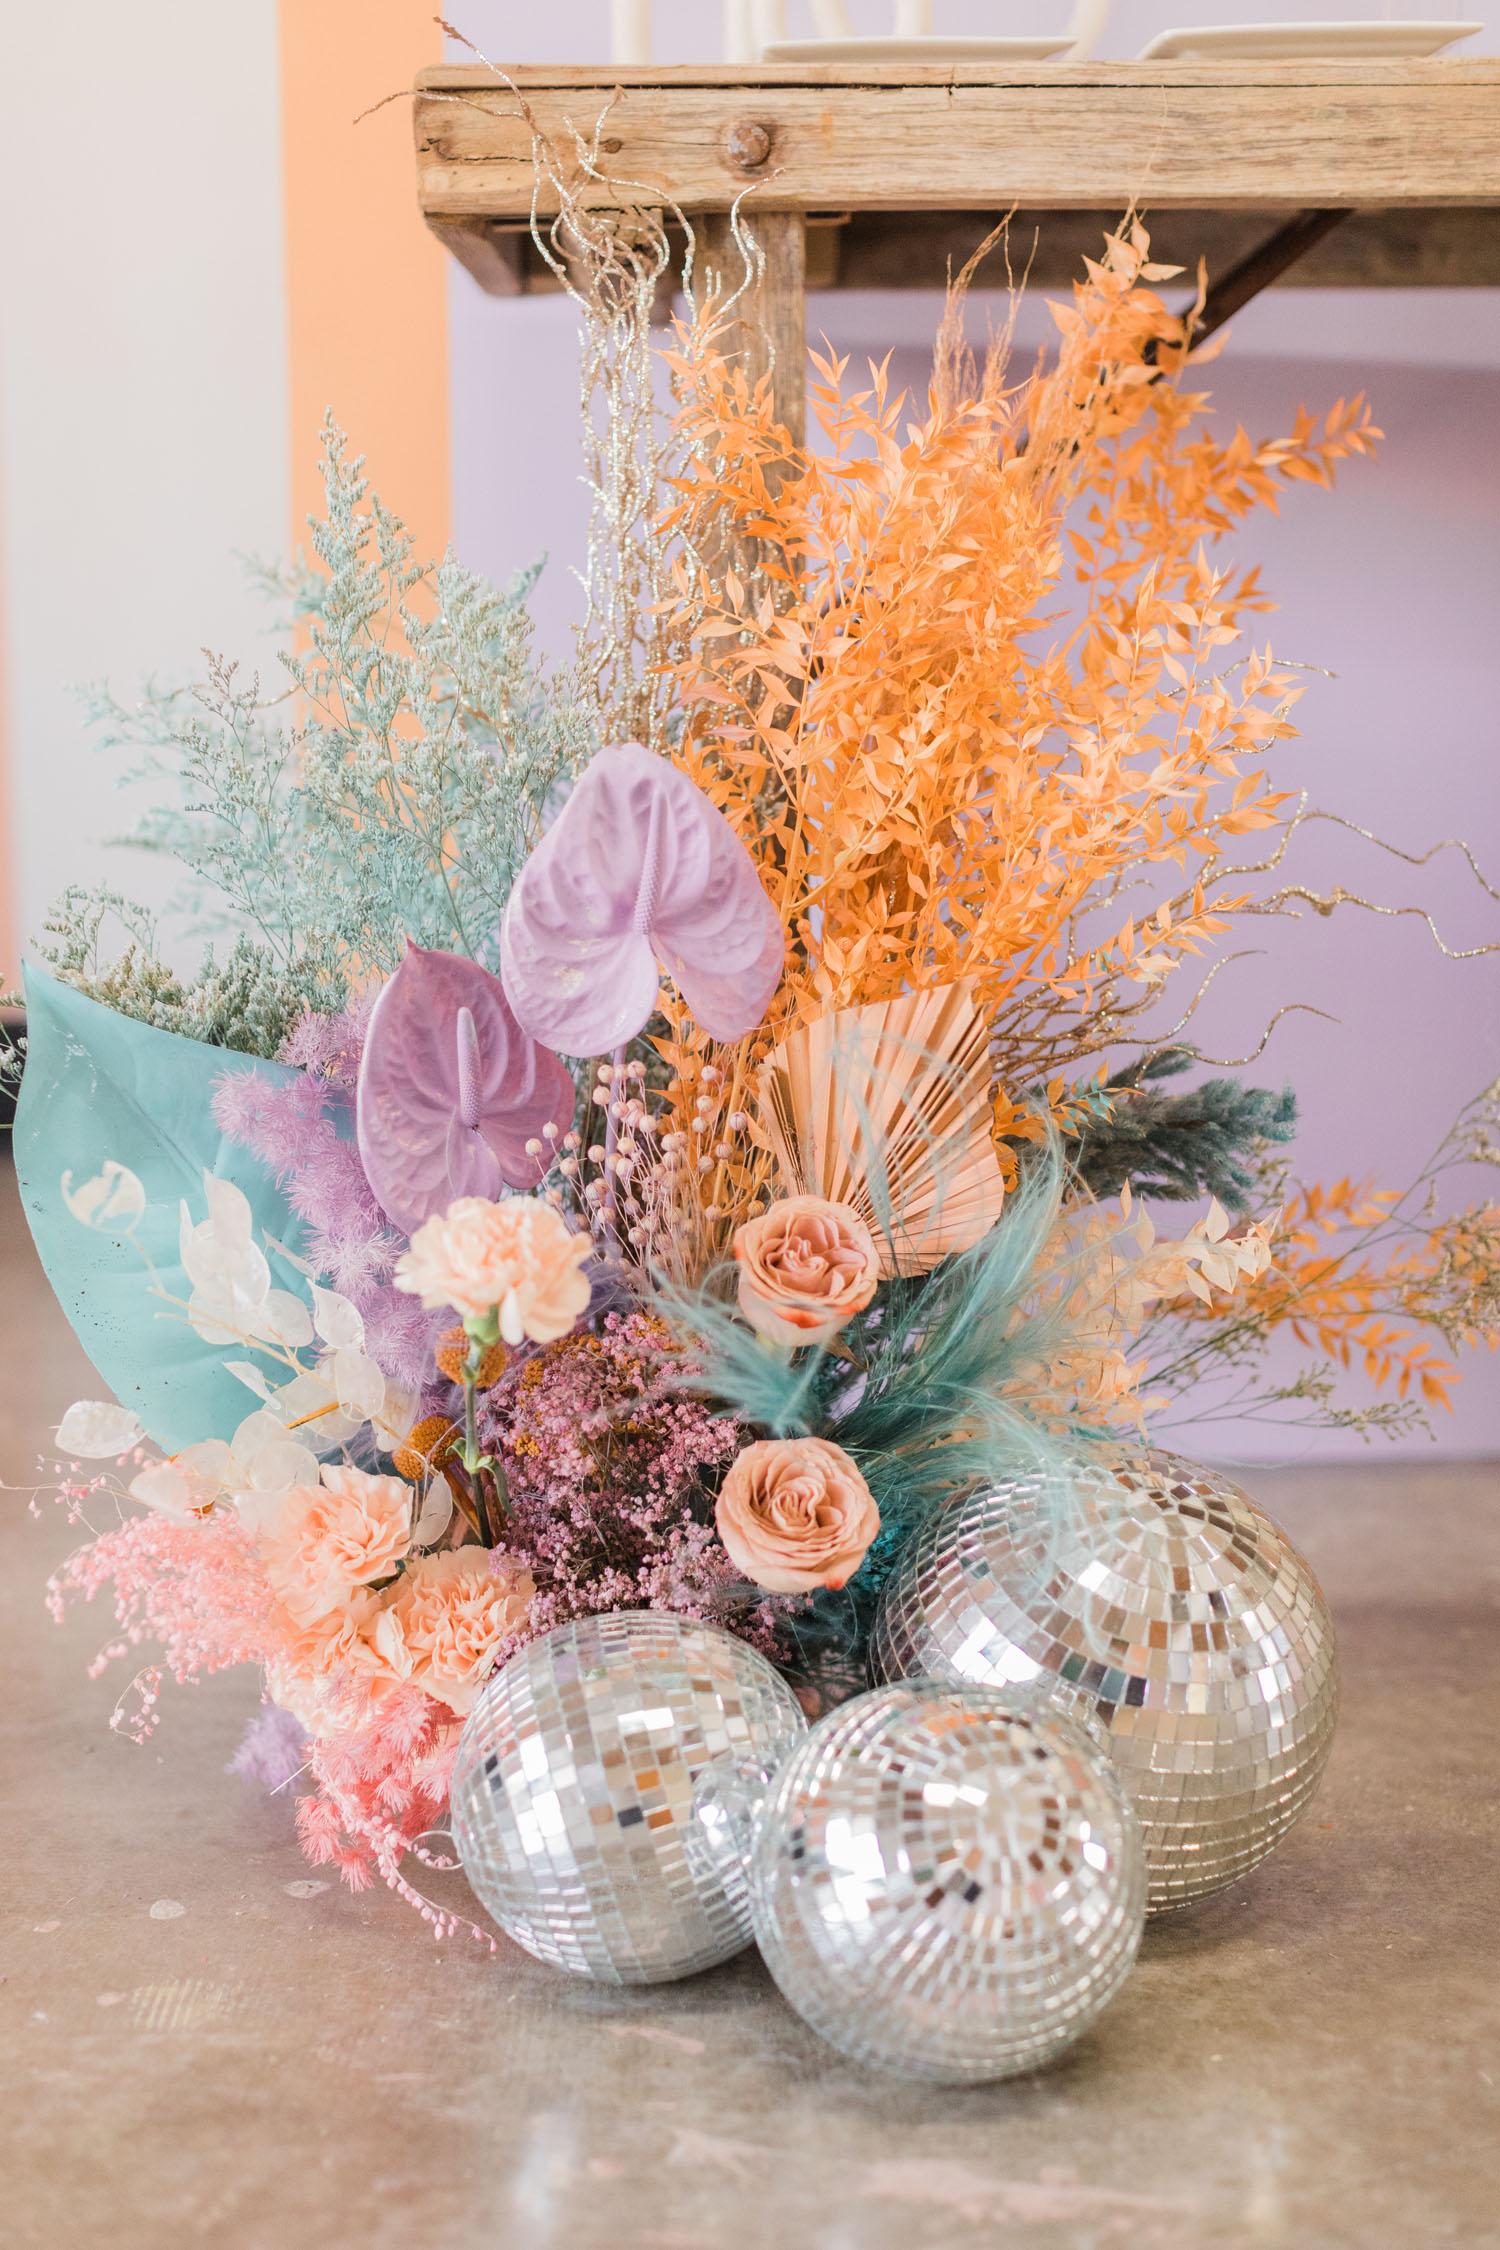 disco ball florals